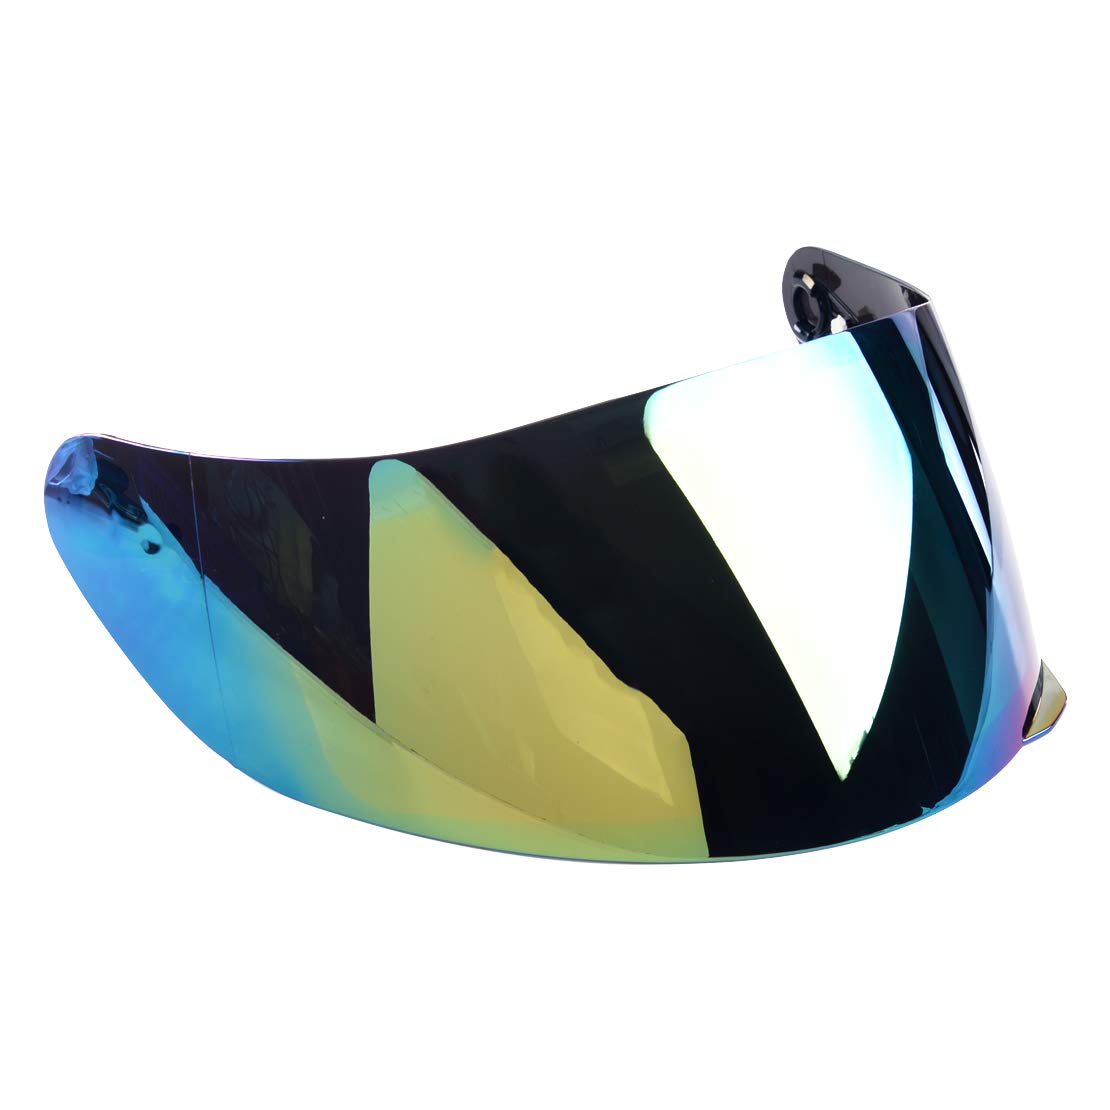 eastar Rainbow Motorcycle Safety Wind Shield Helmet Lens Wide Visor Fit For AGV K1 K3SV K5